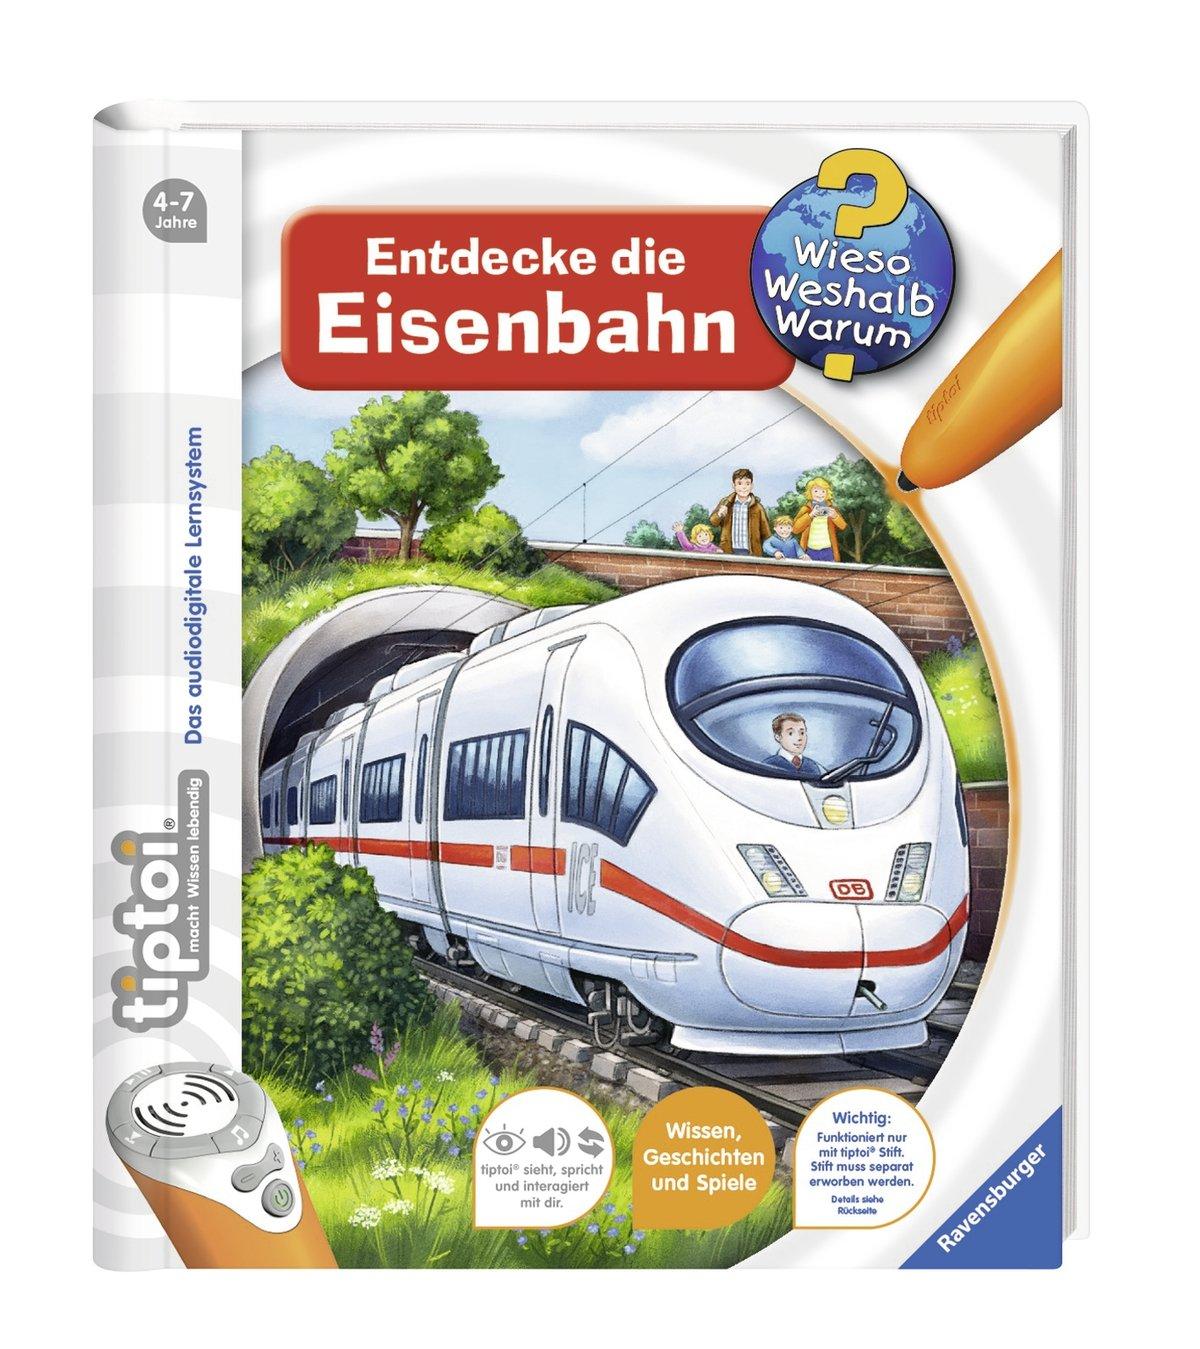 tiptoi Entdecke die Eisenbahn (Alemán) Encuadernación en espiral – 1 abr 2015 Inka Friese Joachim Krause Ravensburger Buchverlag 3473329177